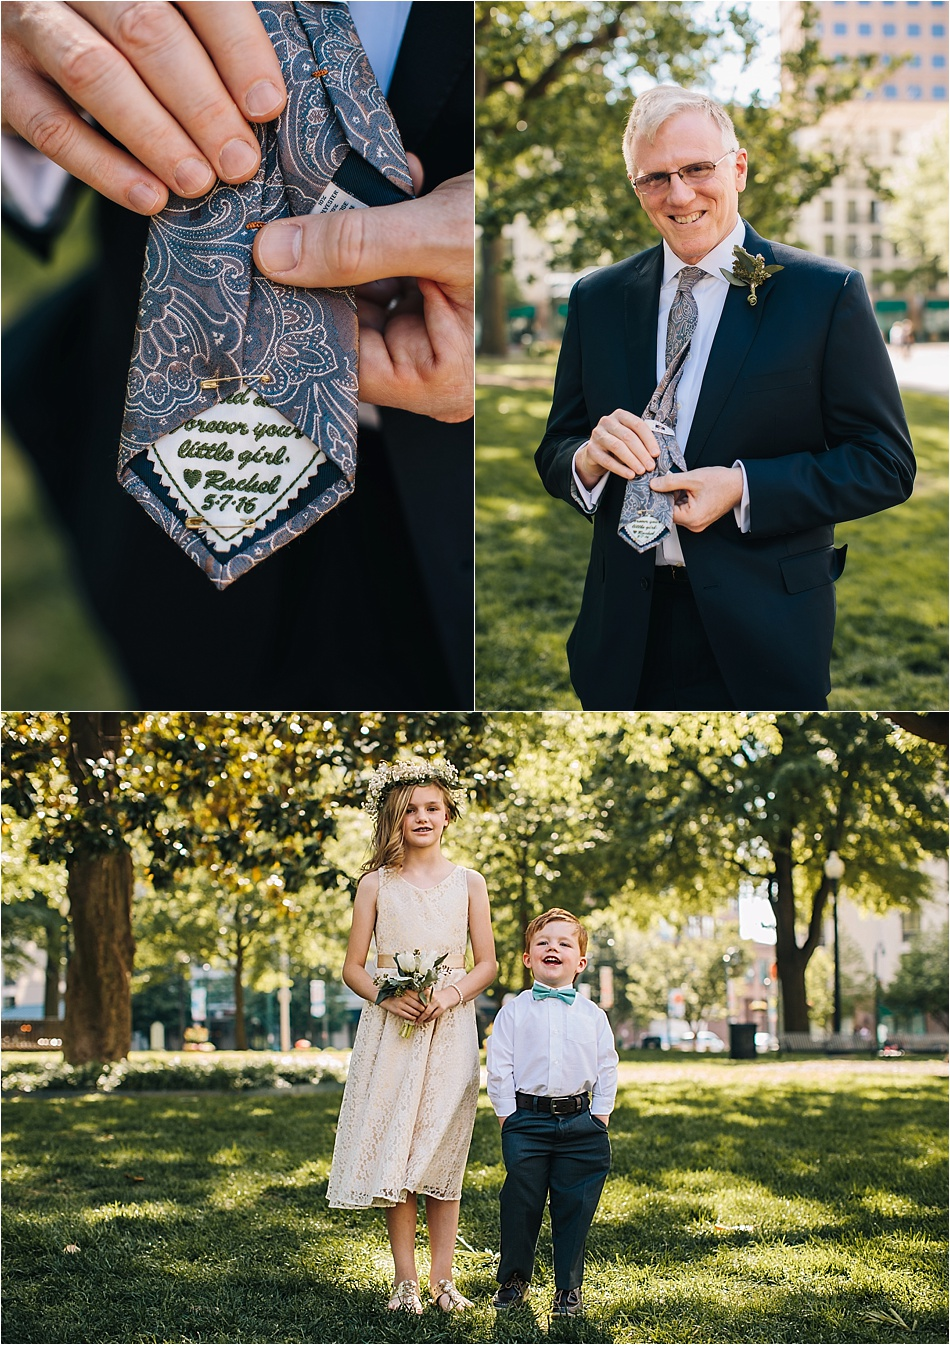 CK-Photo-Nashville-Wedding-Photographer-_0012.jpg